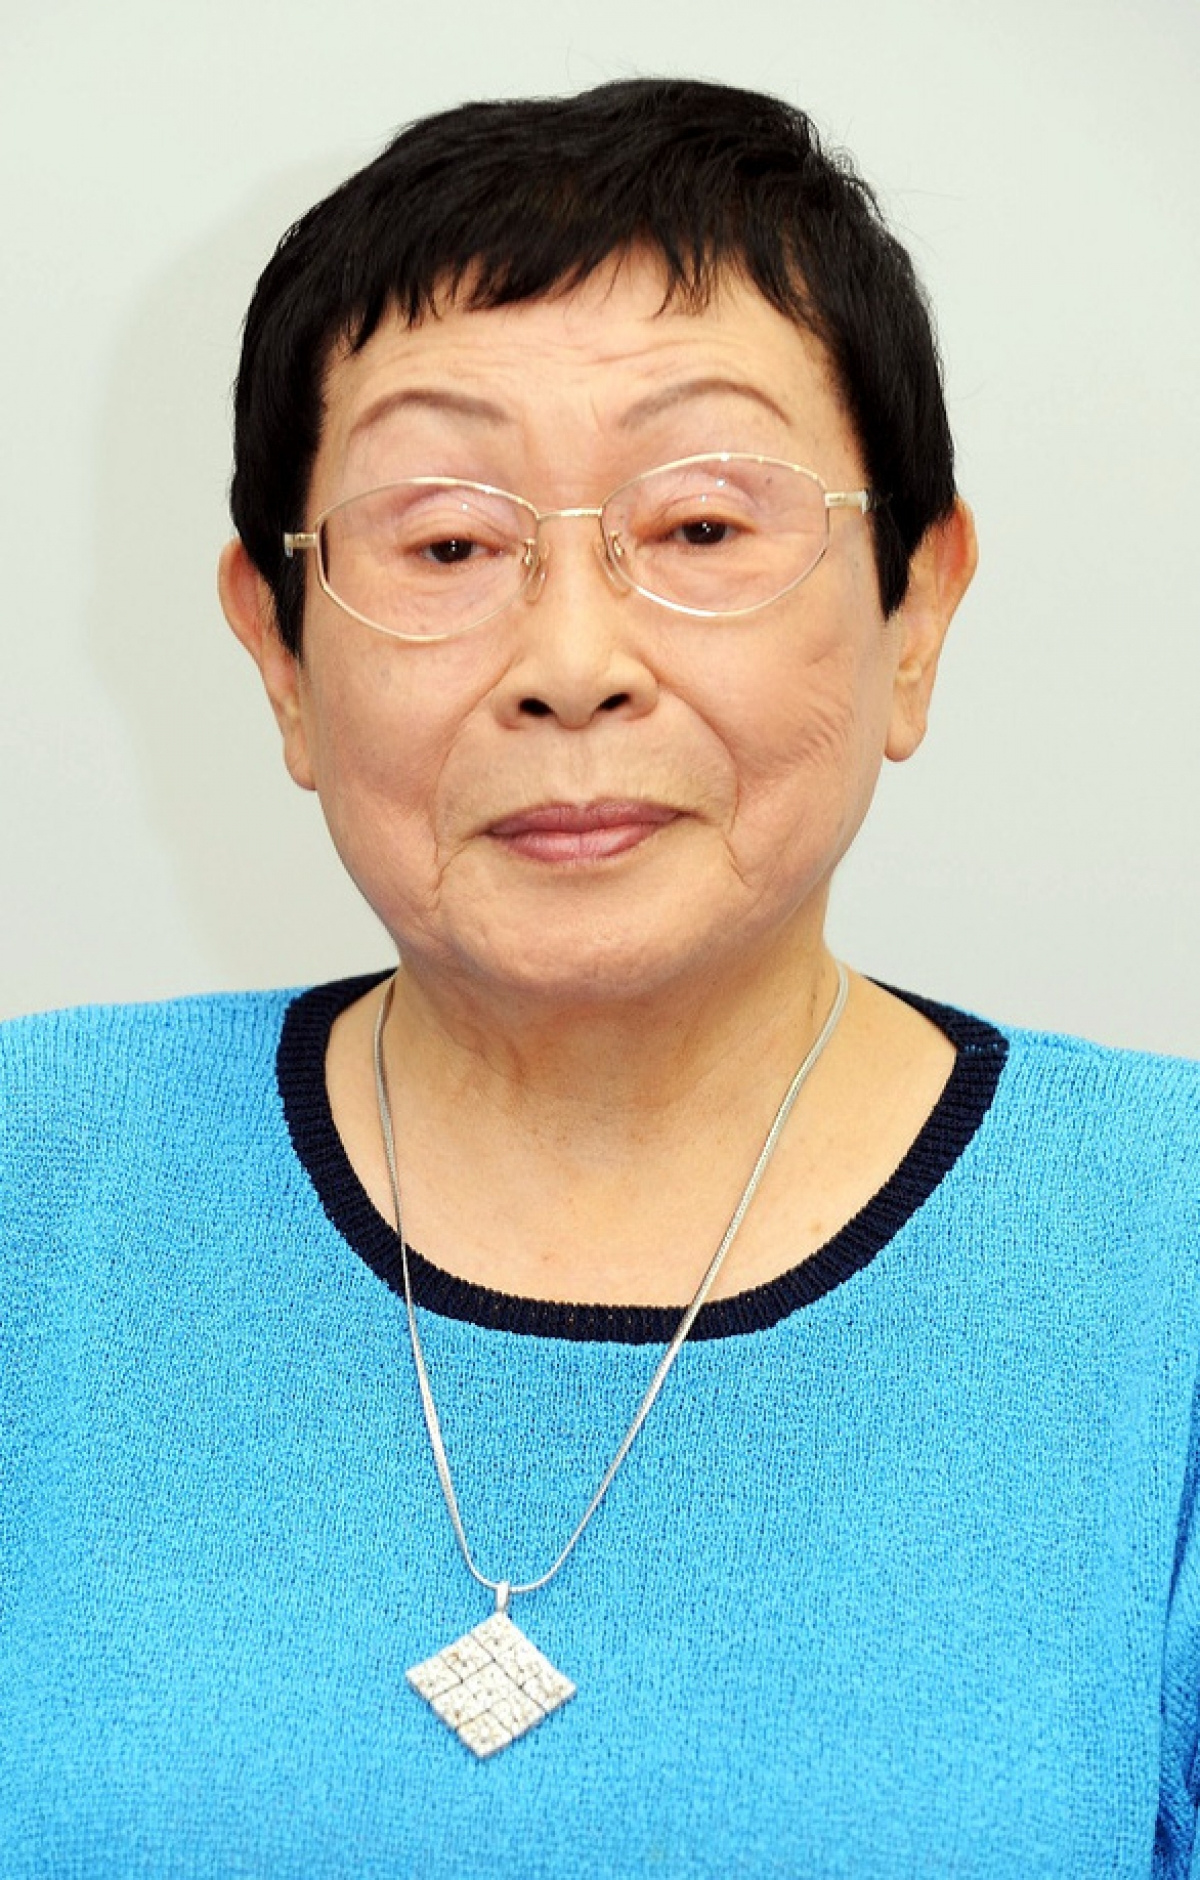 Biên kịch kỳ cựu Sugako Hashida - Ảnh: WIKIPEDIA